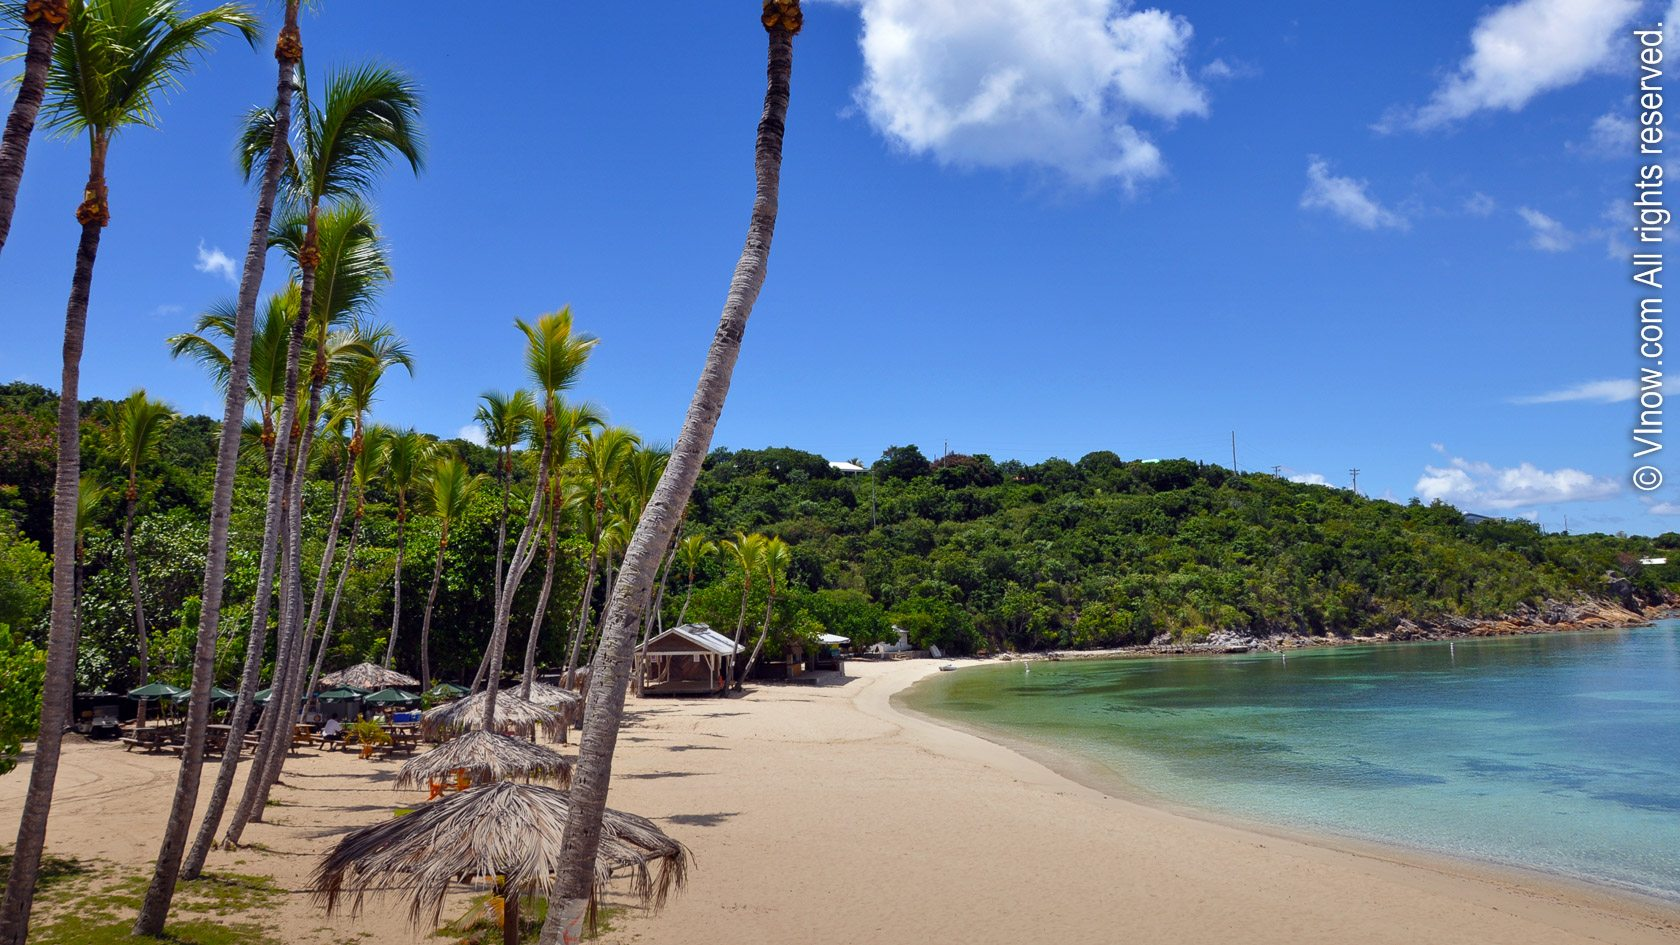 Honeymoon, Water Island